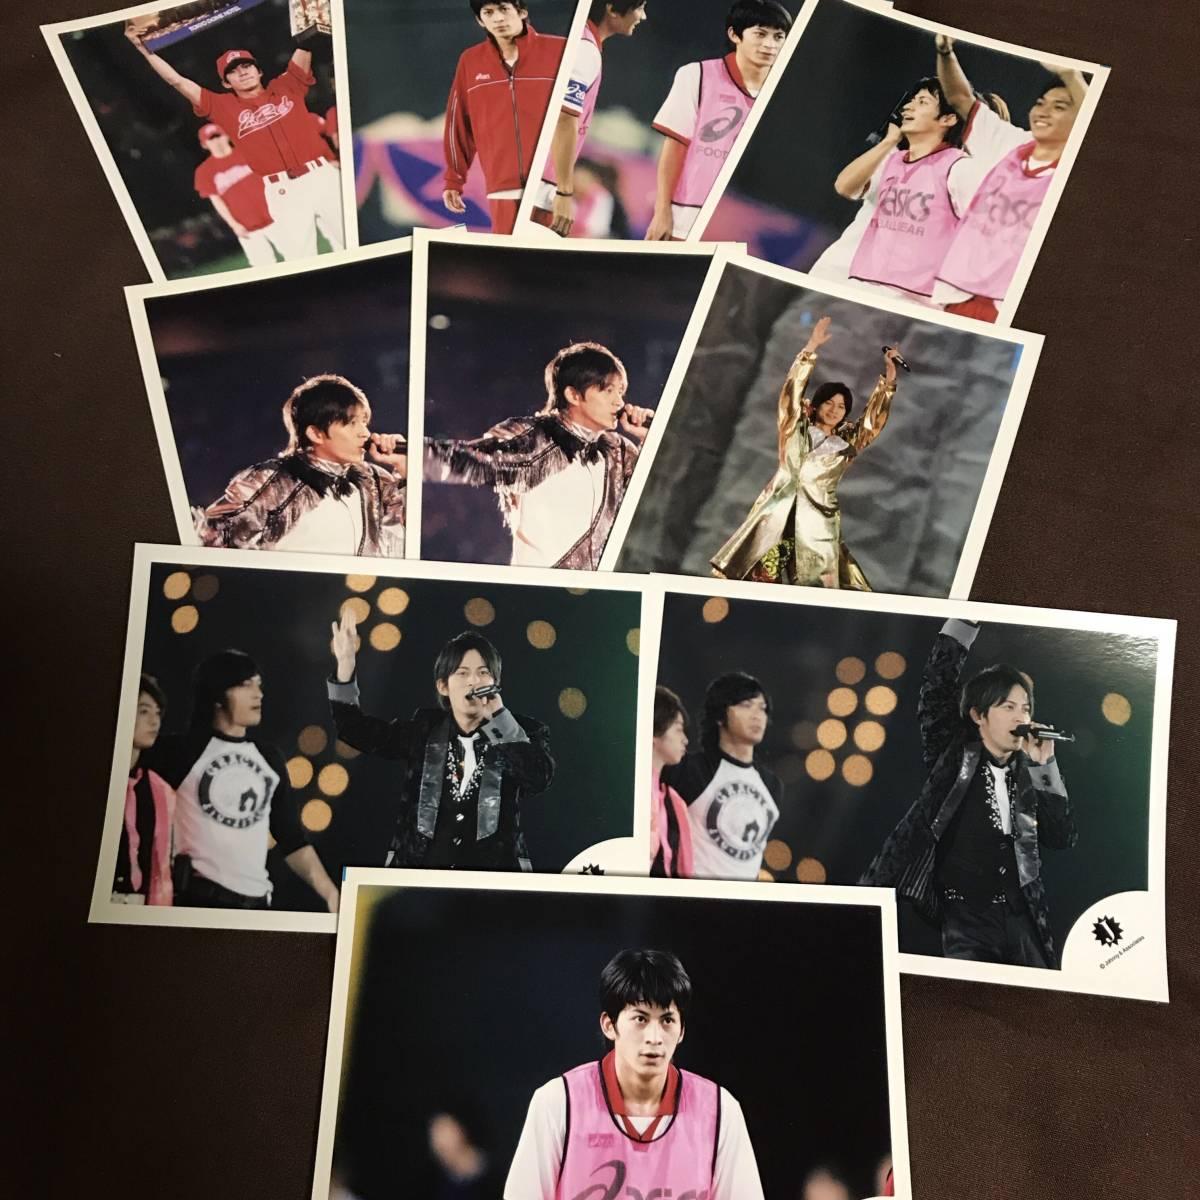 V6 岡田准一 公式写真 写真 ブロマイド グッズ ④ コンサートグッズの画像